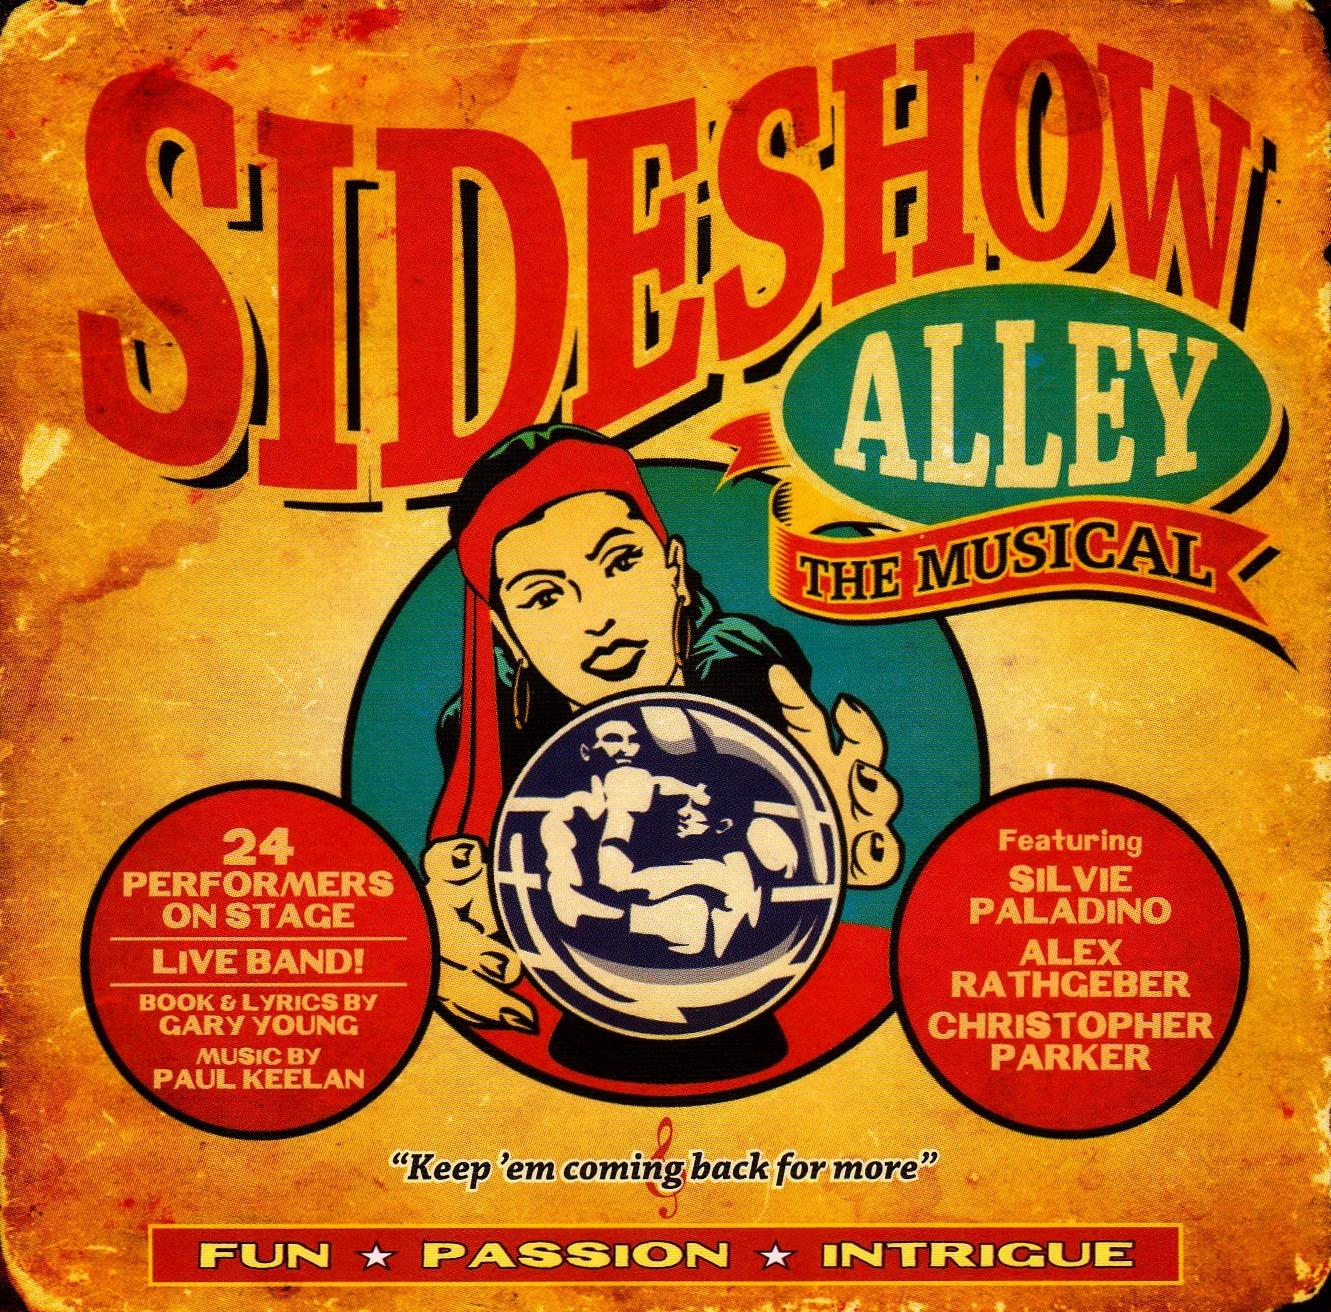 1 - Sideshow Alley logo. jpg.jpg